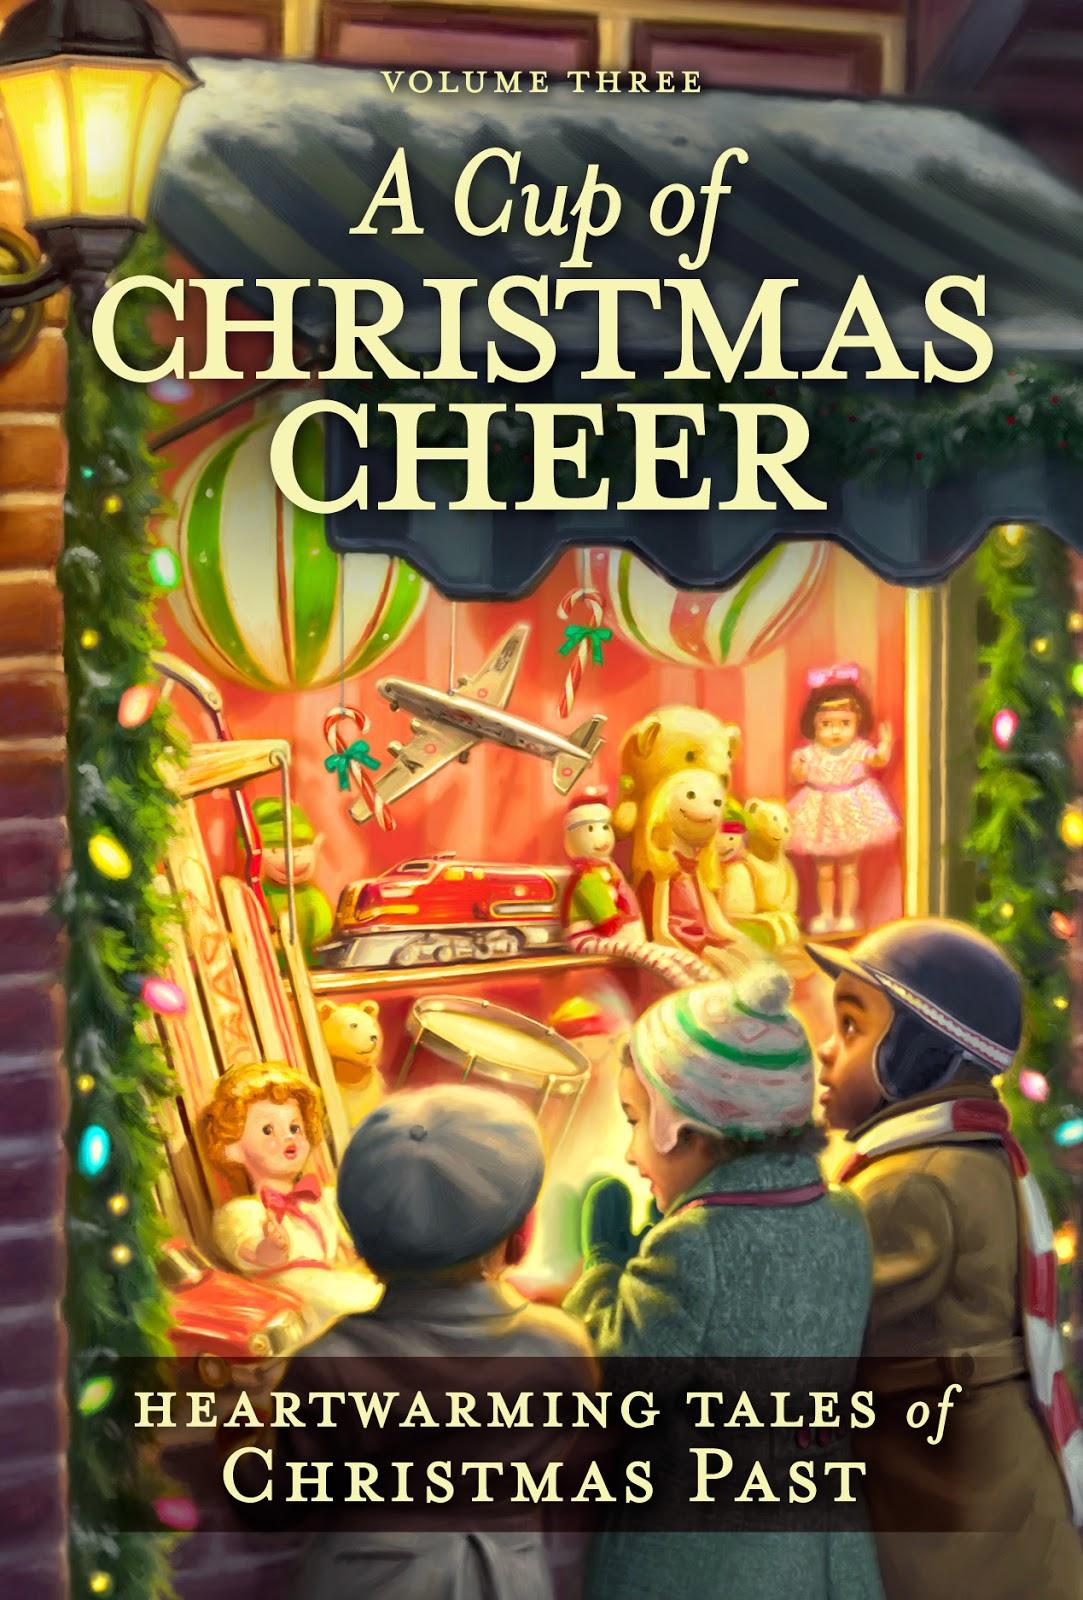 http://www.shopguideposts.org/christmascheer34-3431.html?utm_source=shopgp_lay3&utm_medium=cupxmas